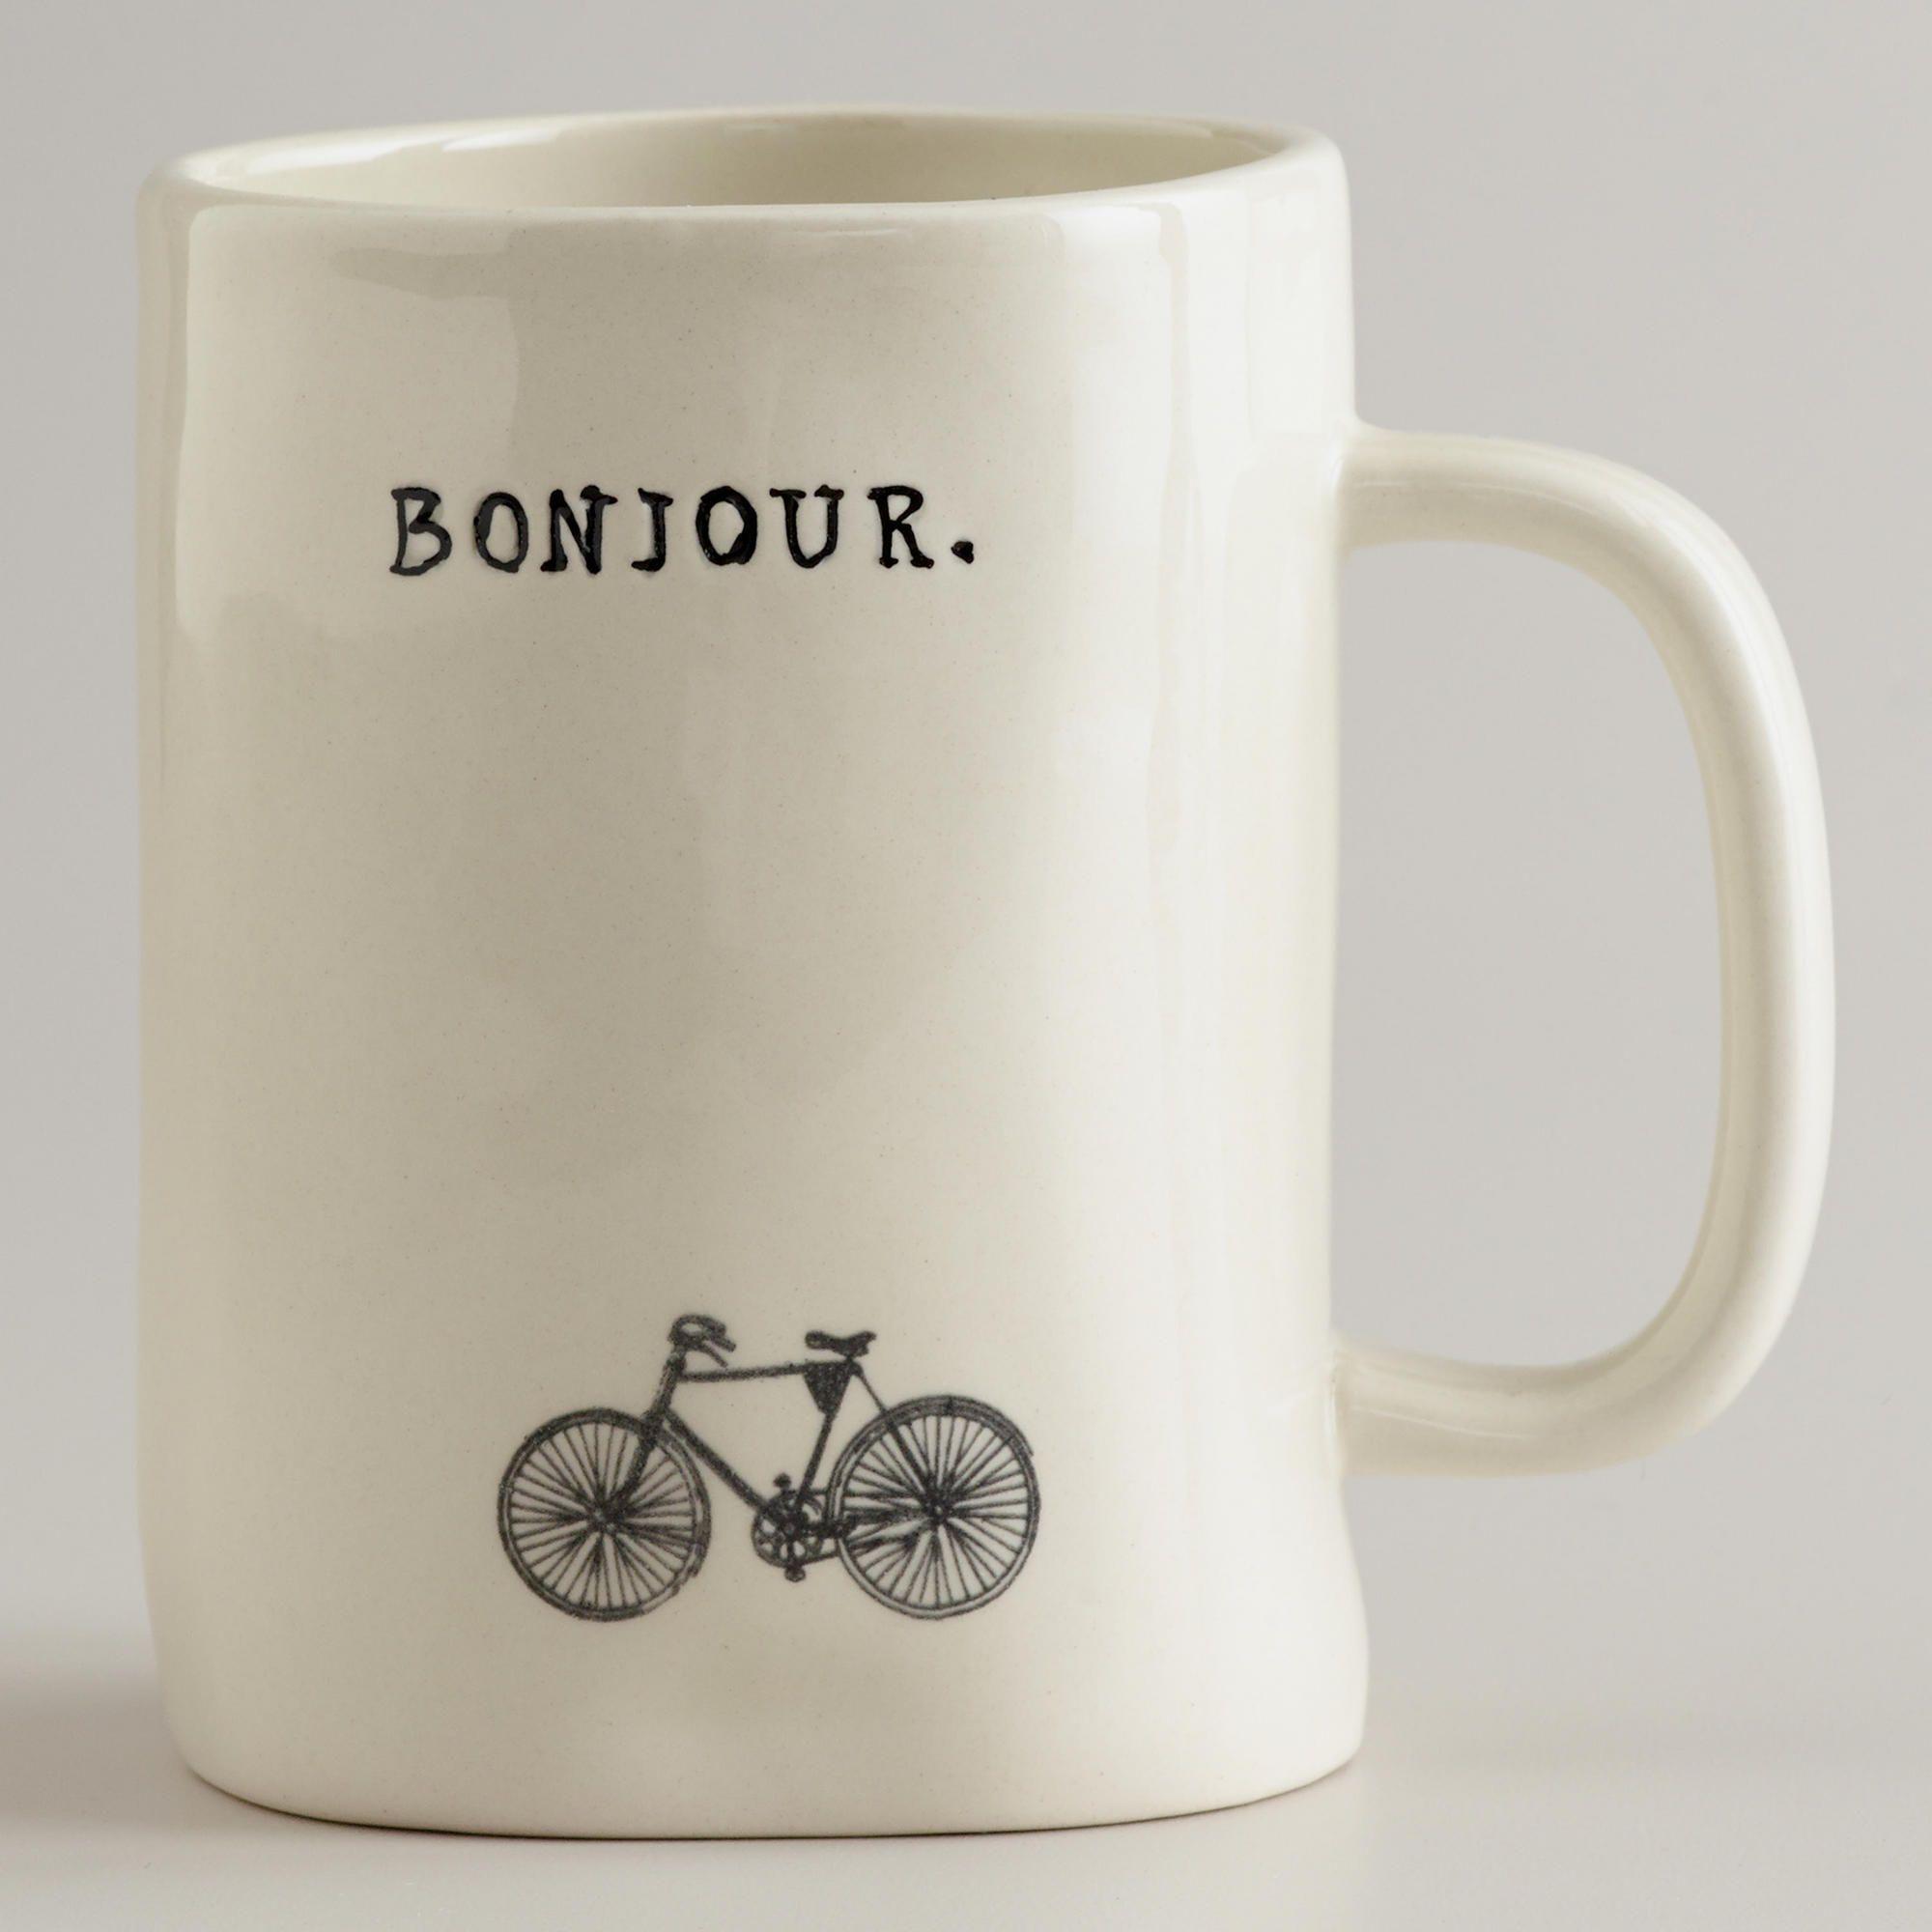 Bonjour Bike Mug World Market Mugs, Tea mugs, Coffee mugs